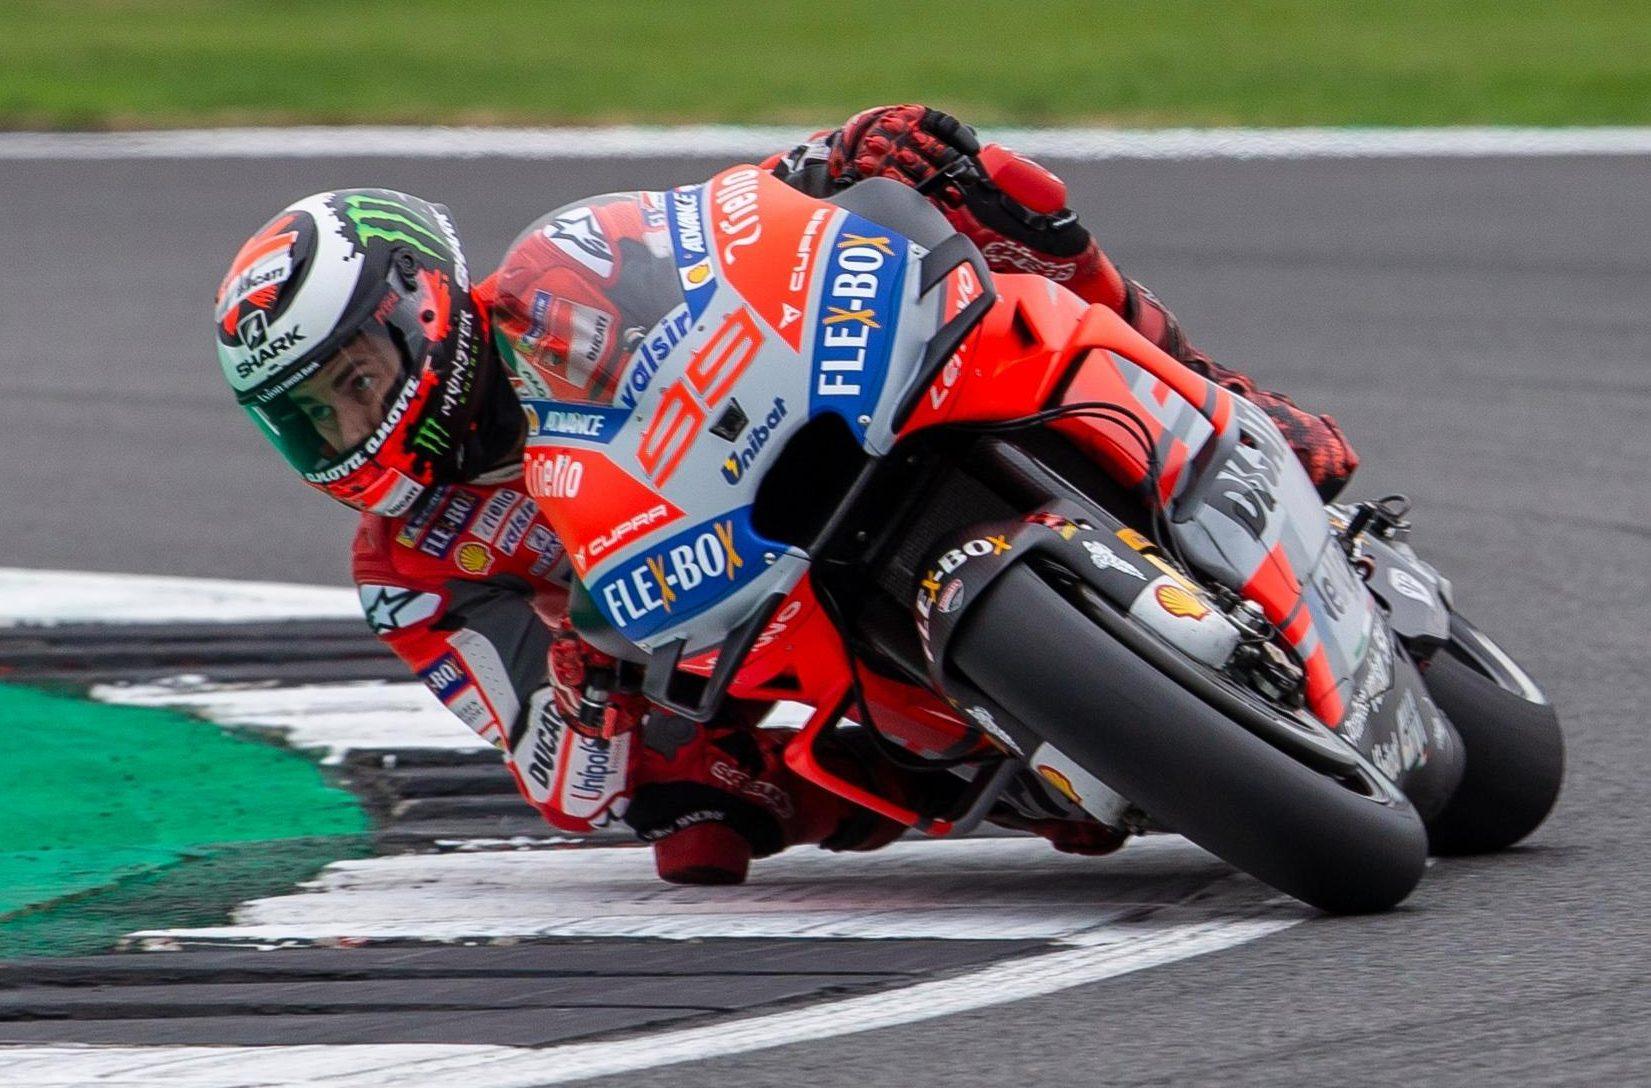 MotoGP is back for the San Marino Grand Prix